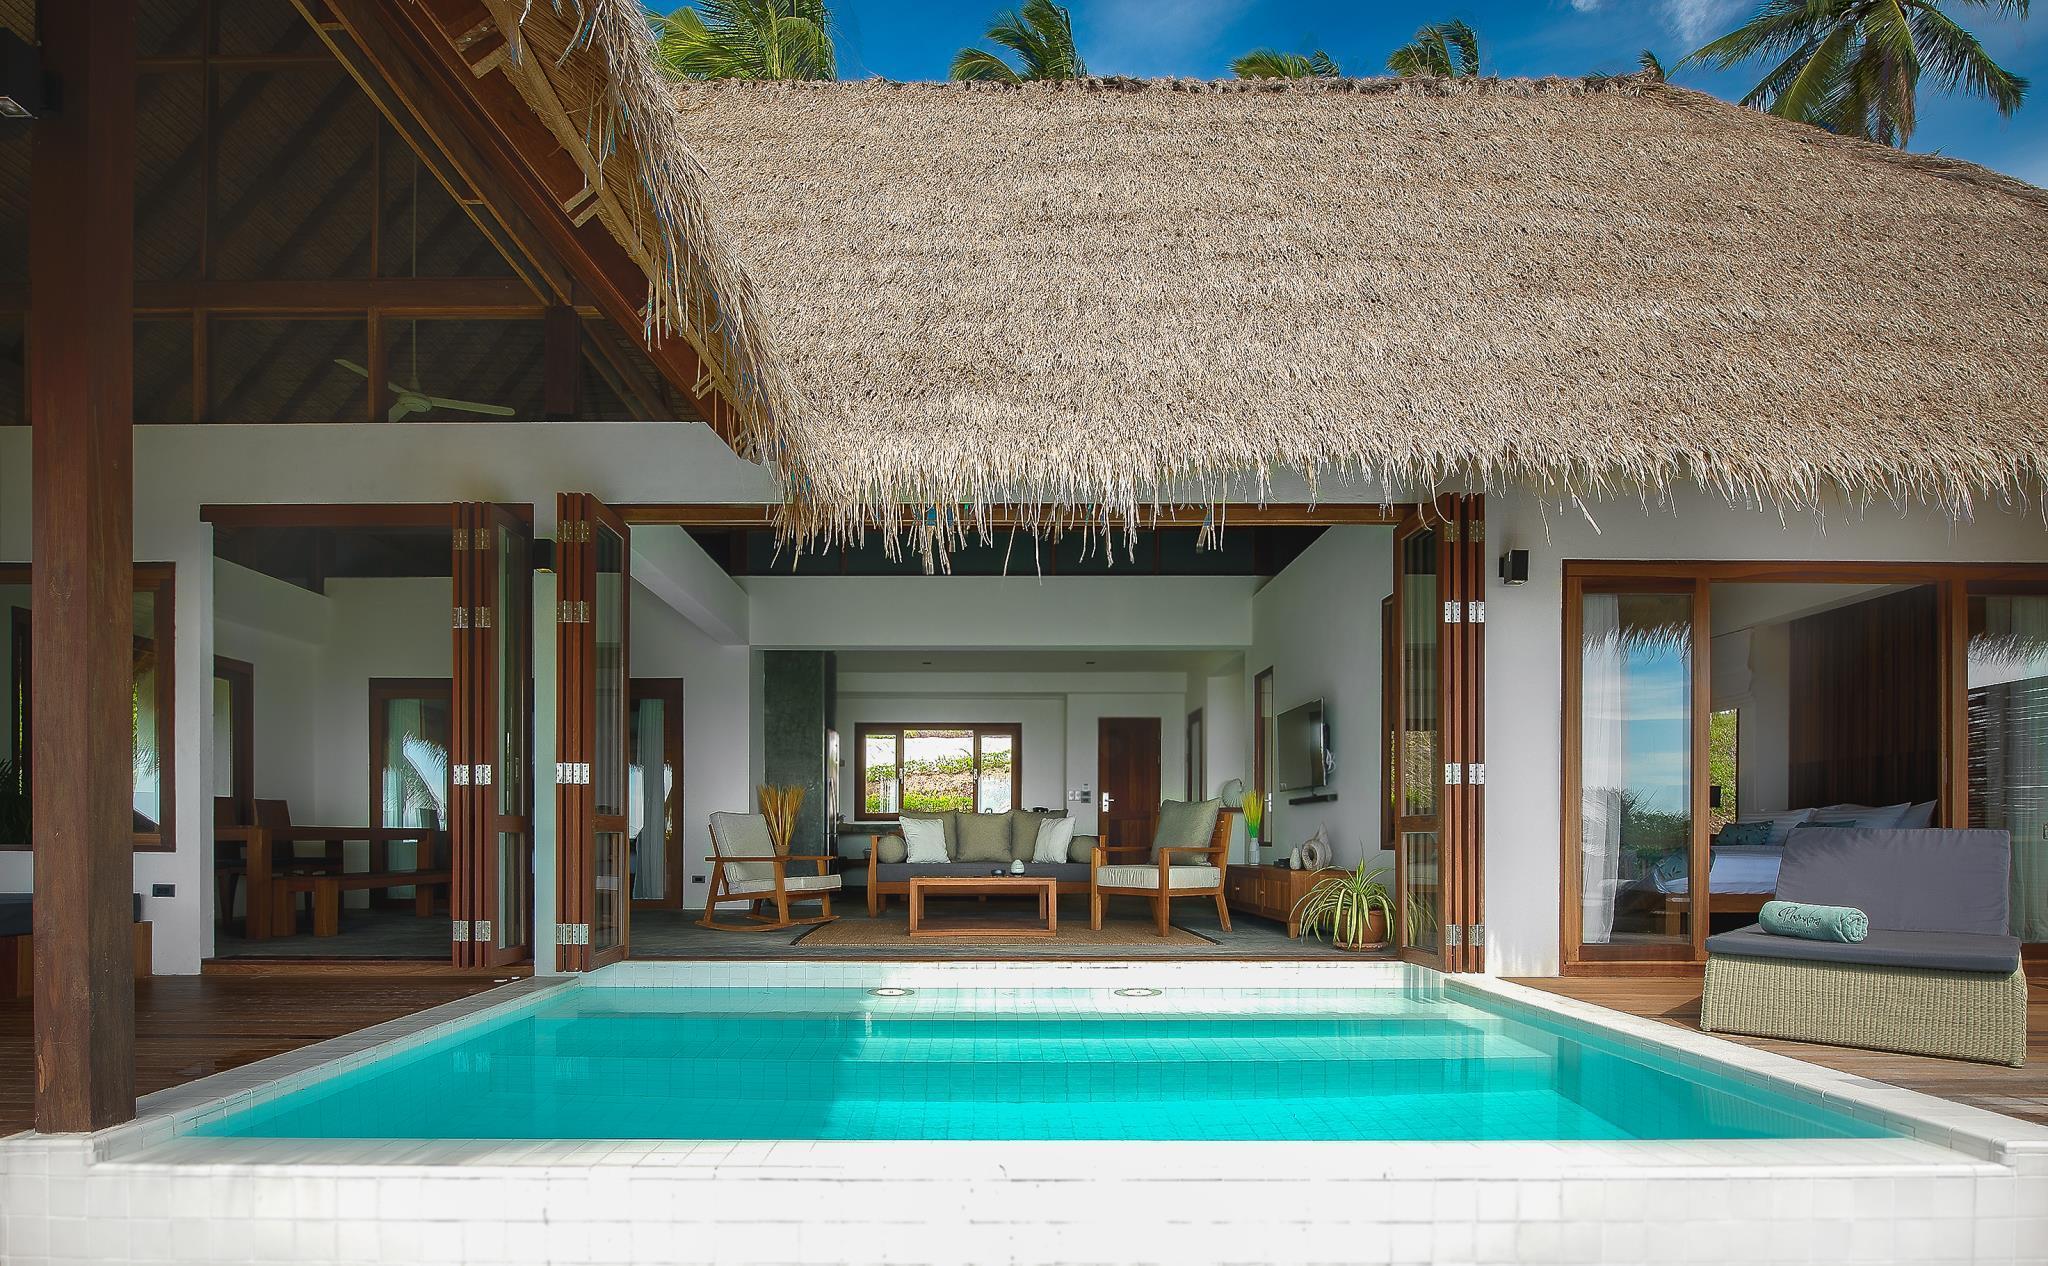 Phandara Luxury Pool Villas Phandara Luxury Pool Villas